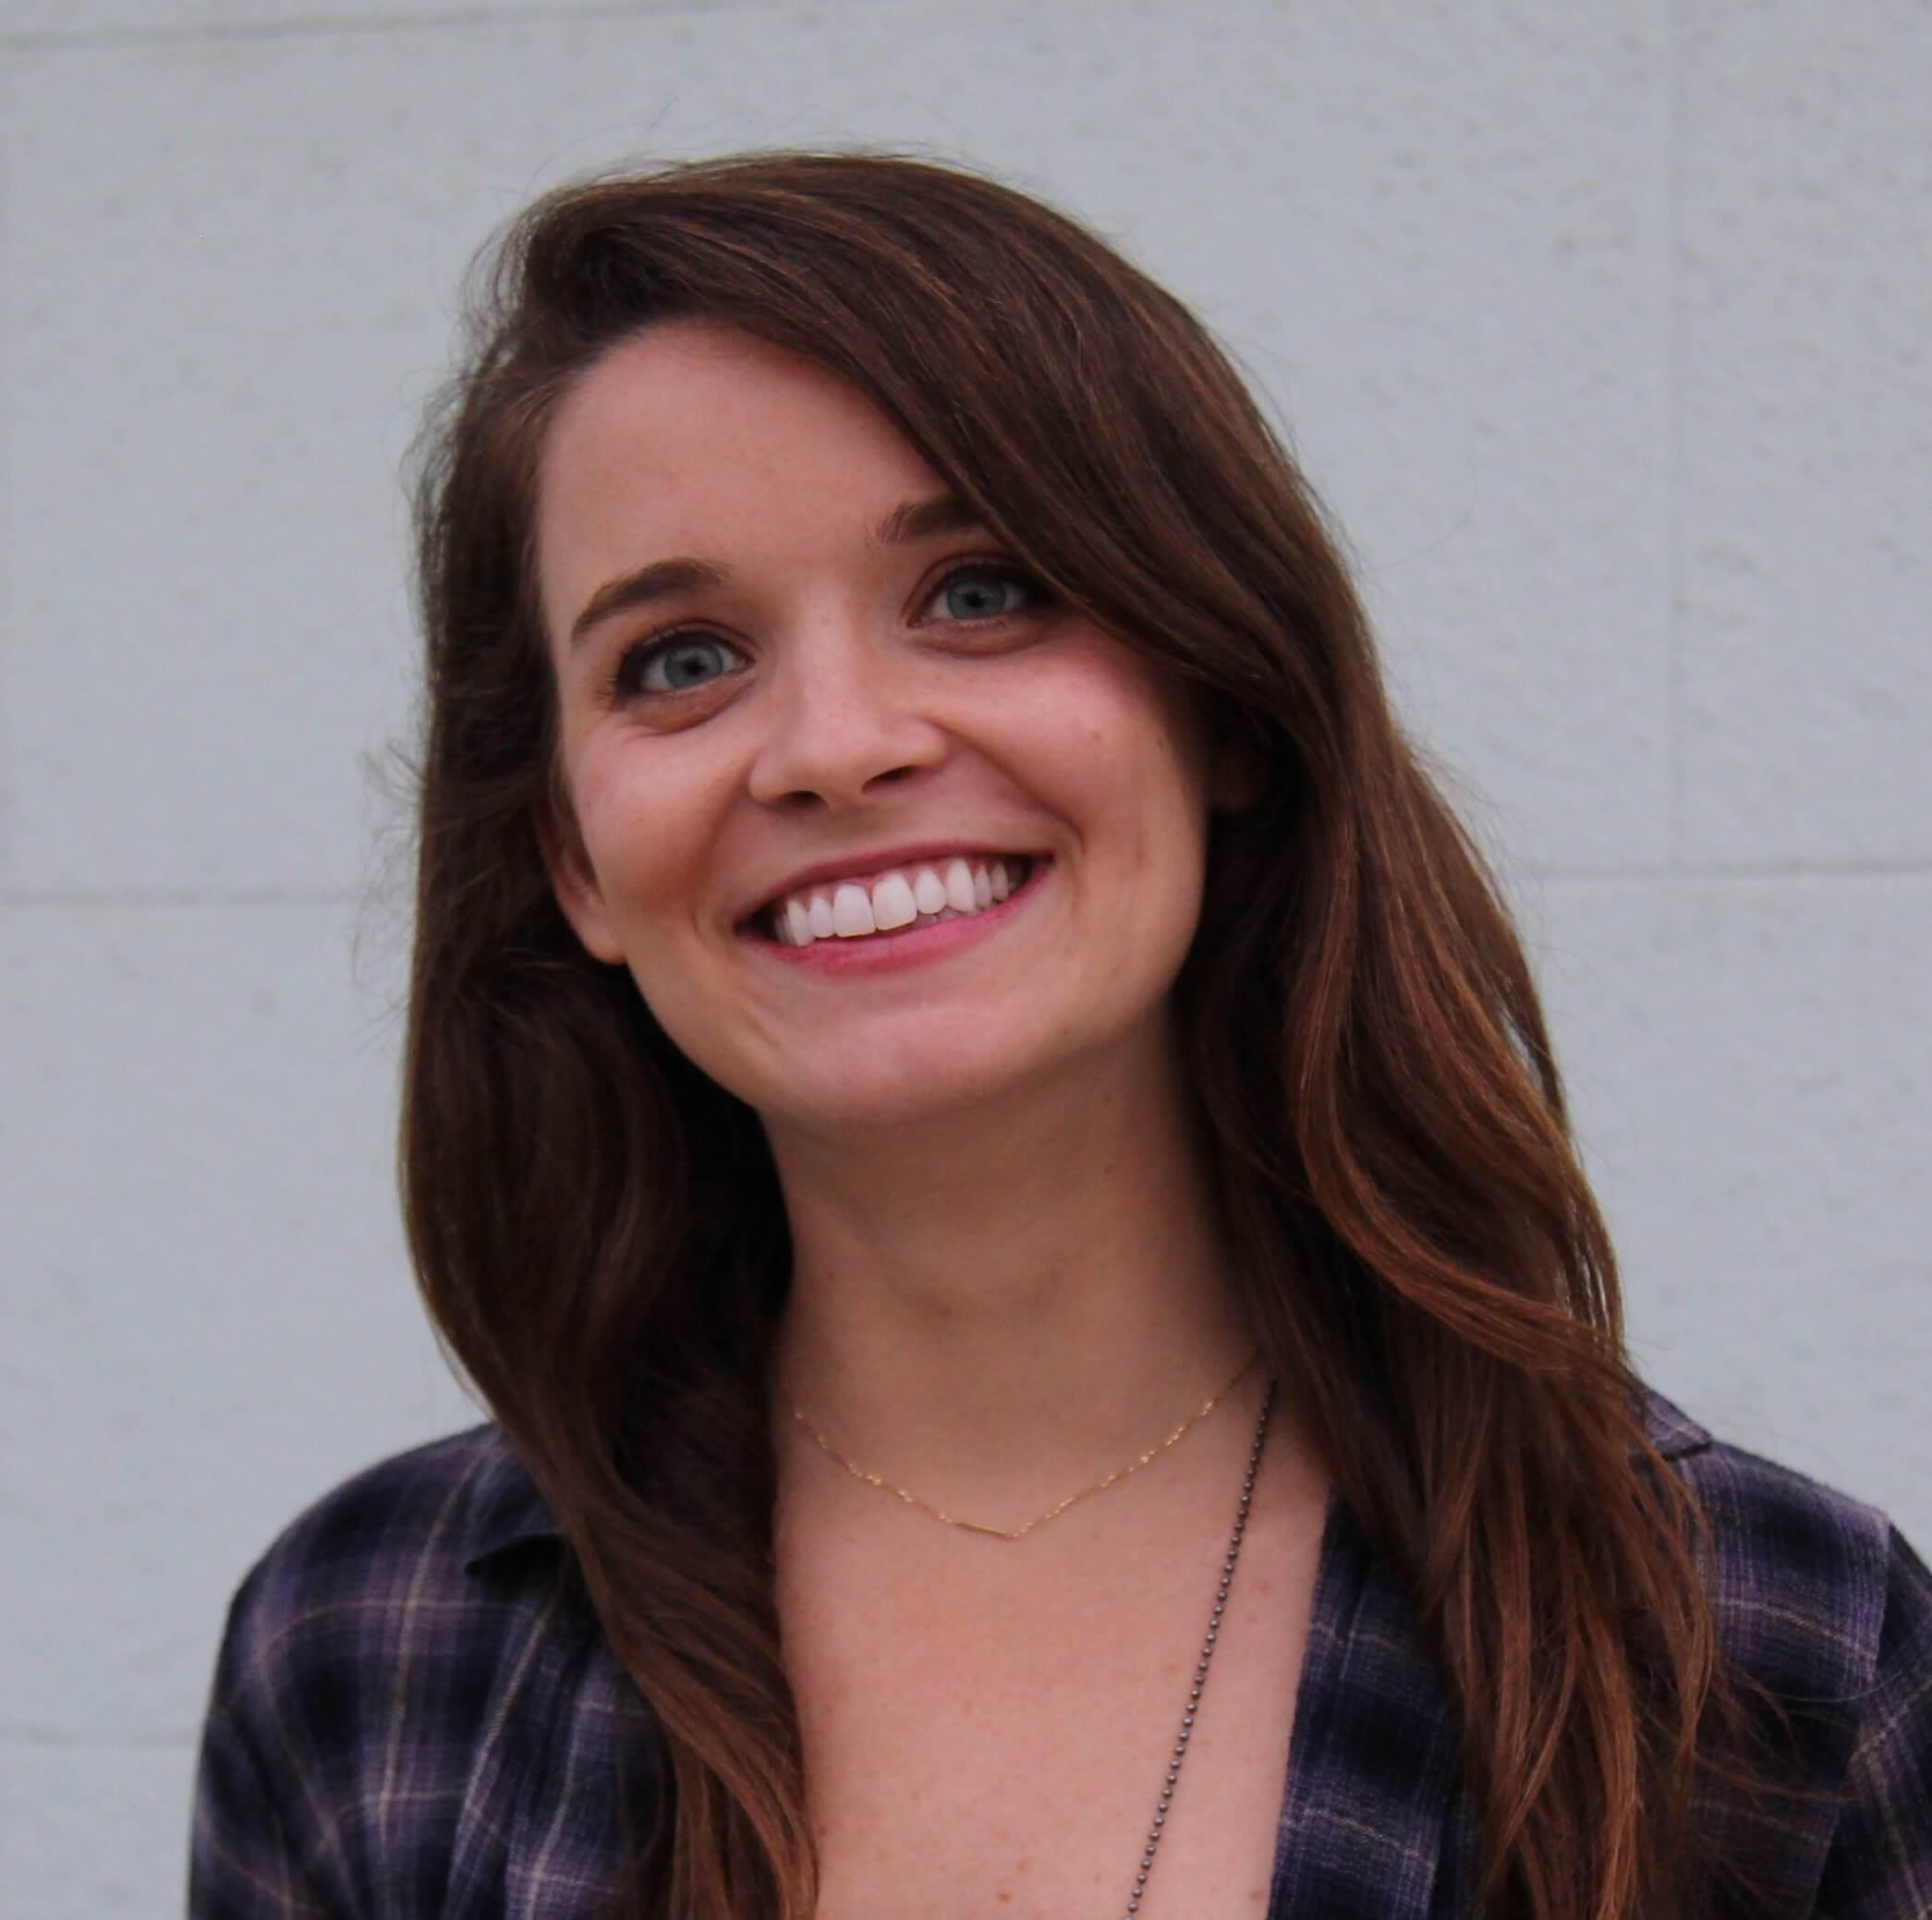 Carly Leahy